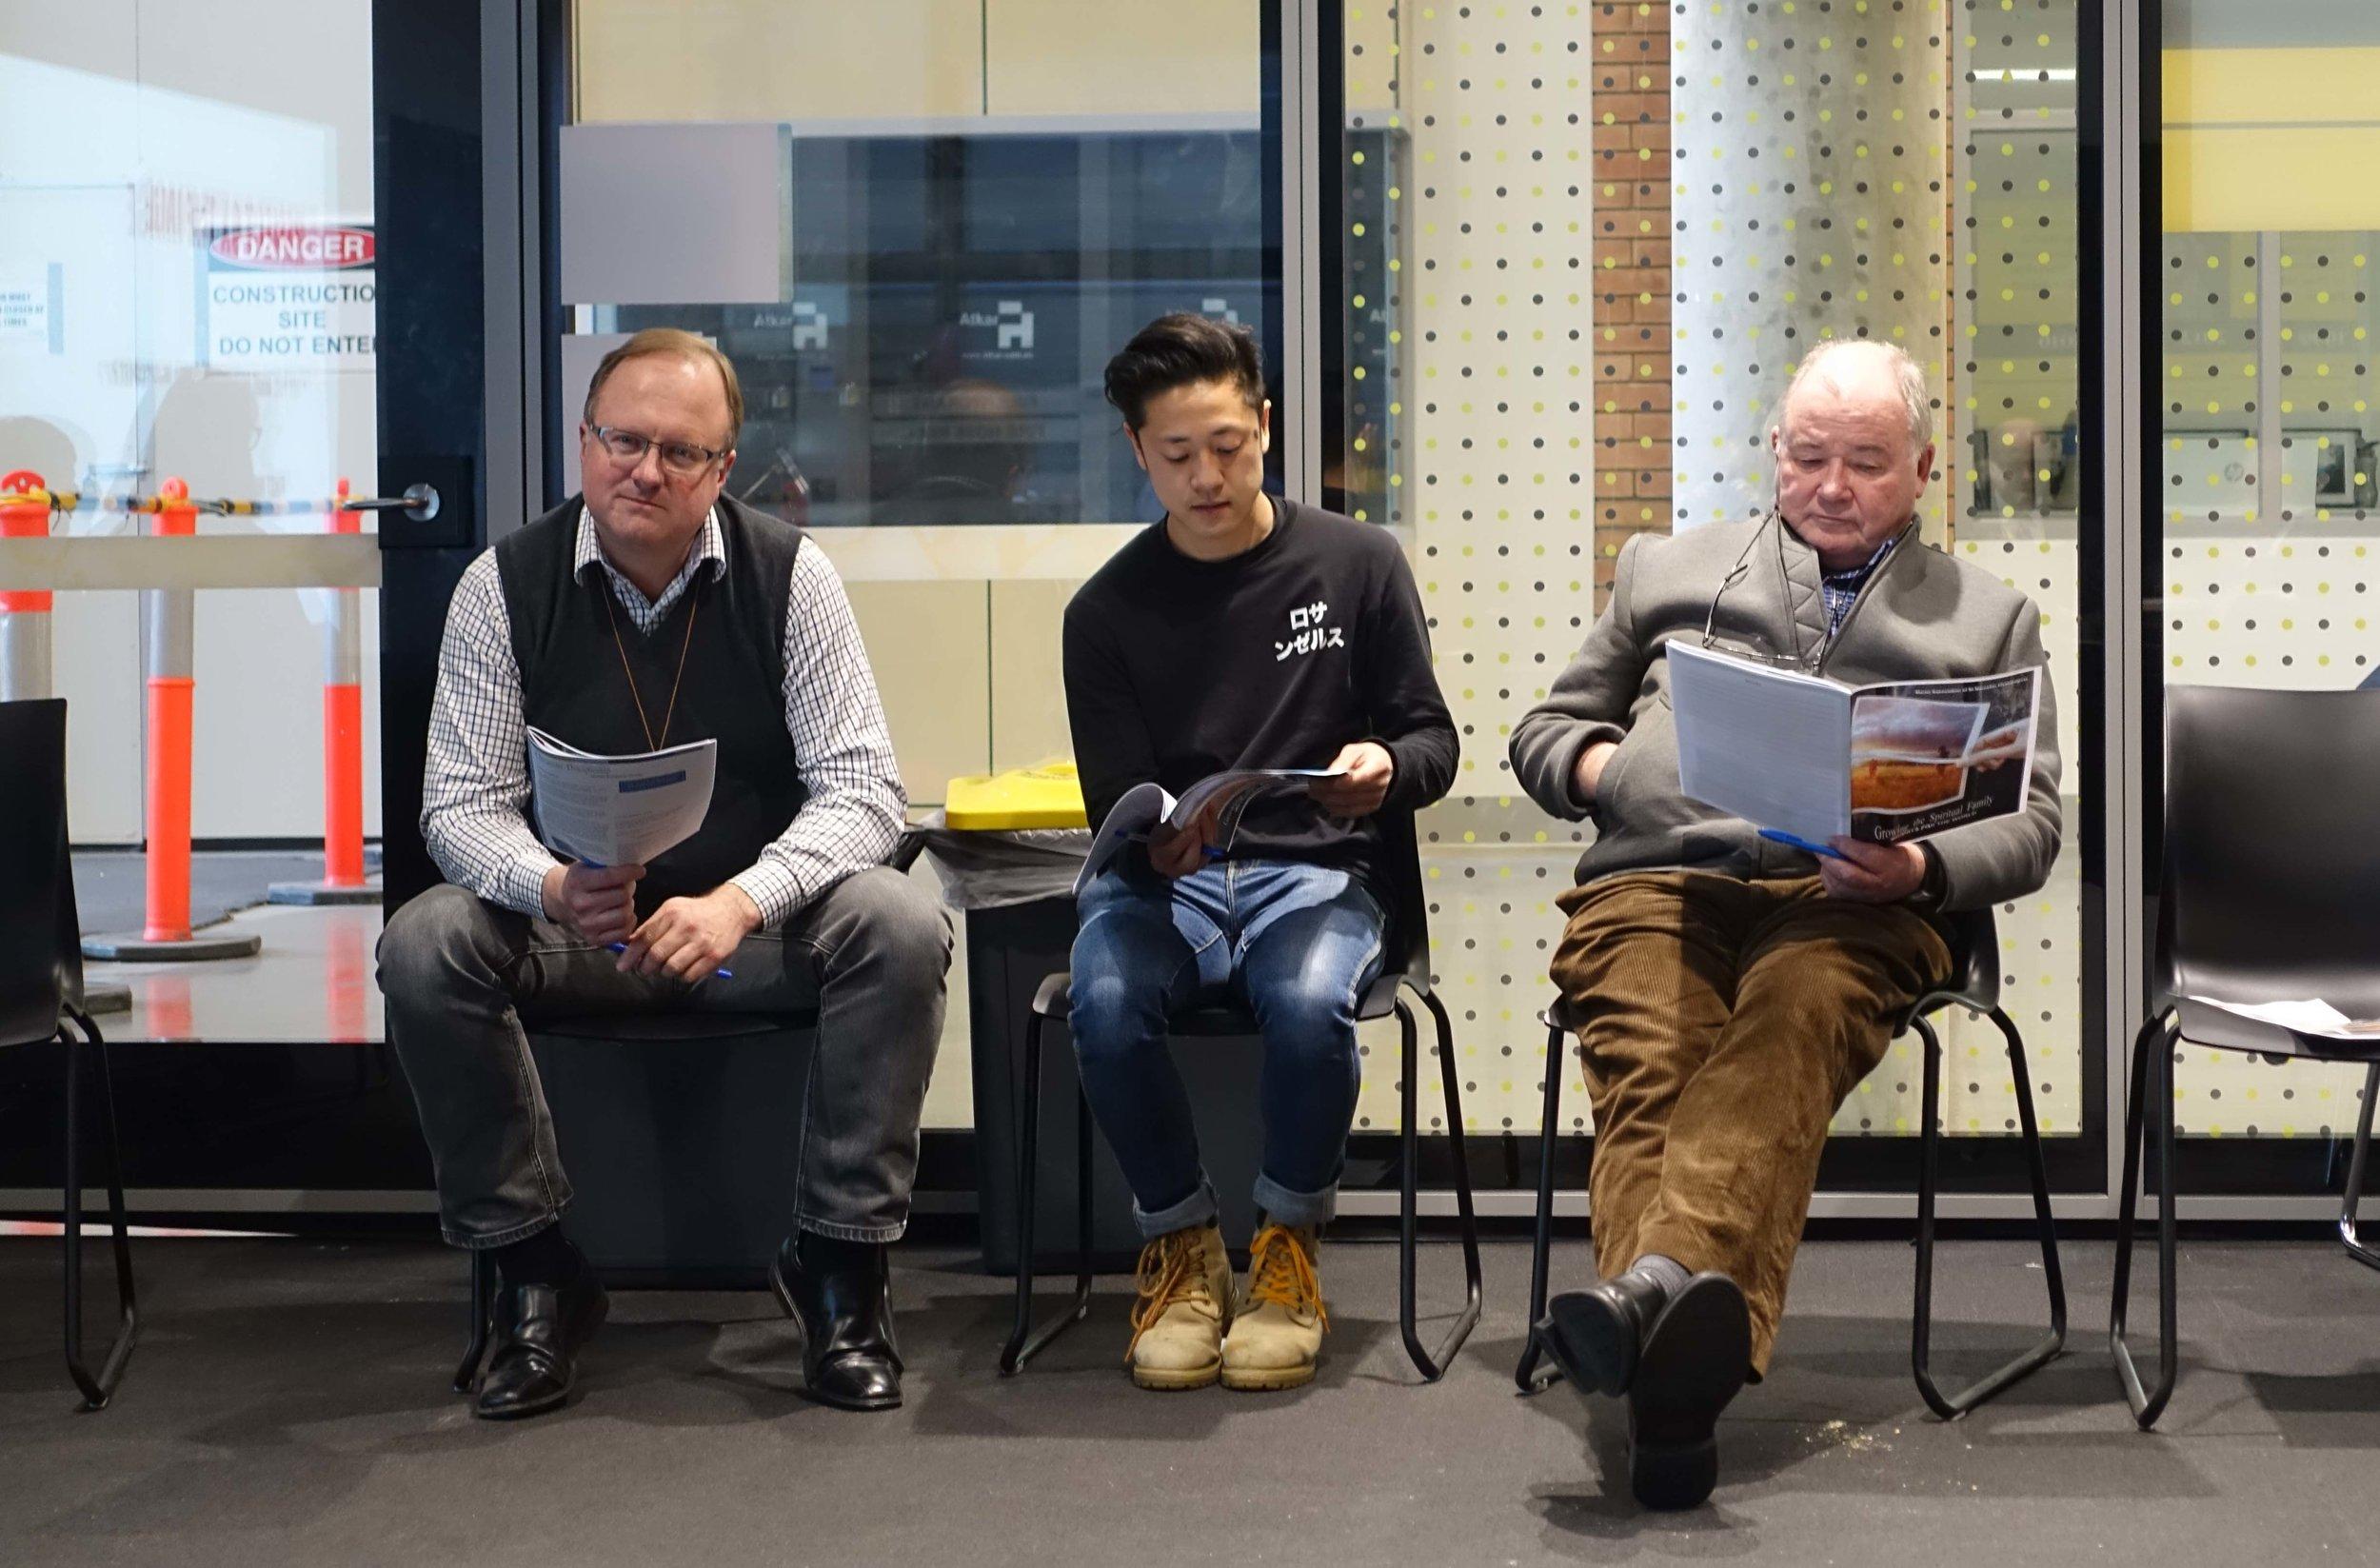 Melbourne Gathering Marcellin College-1-21.jpg